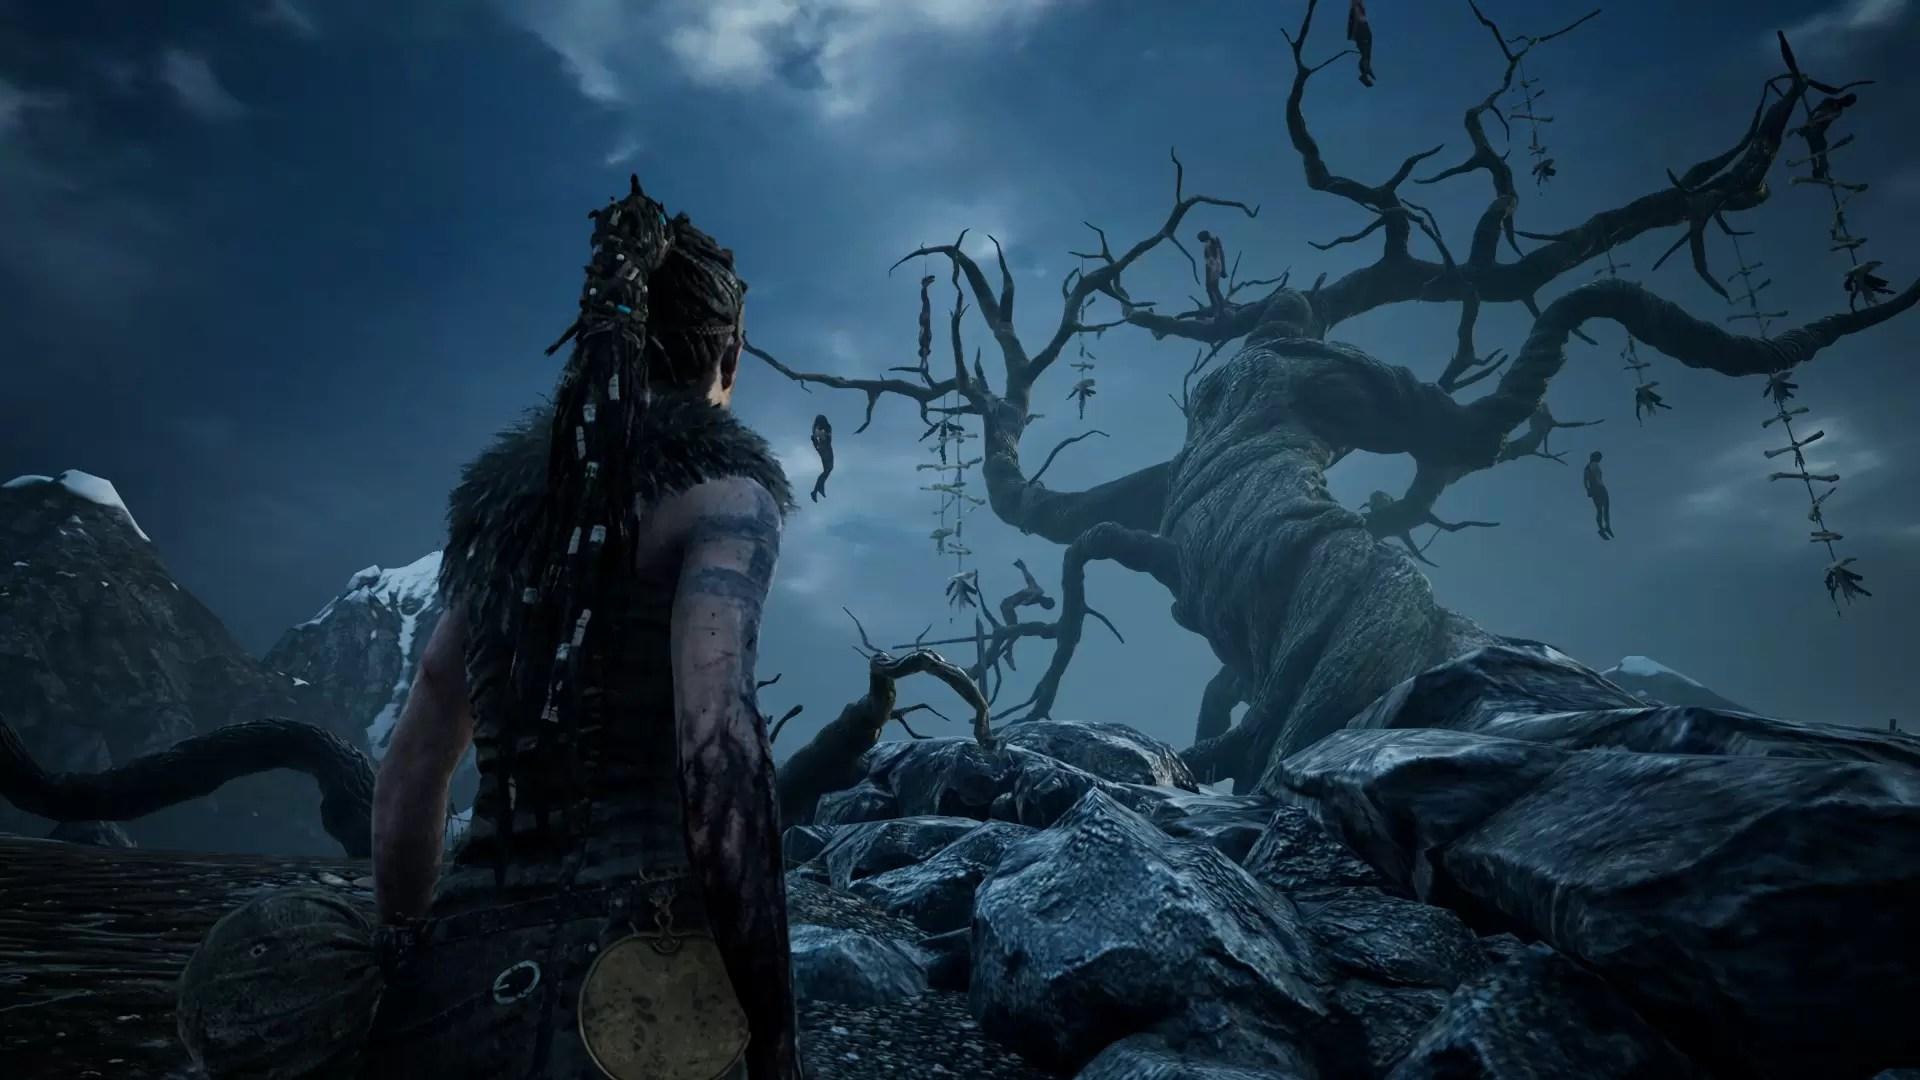 Hd Gamer Wallpaper Haven Reviews Hellblade Senua S Sacrifice Gamer S Haven